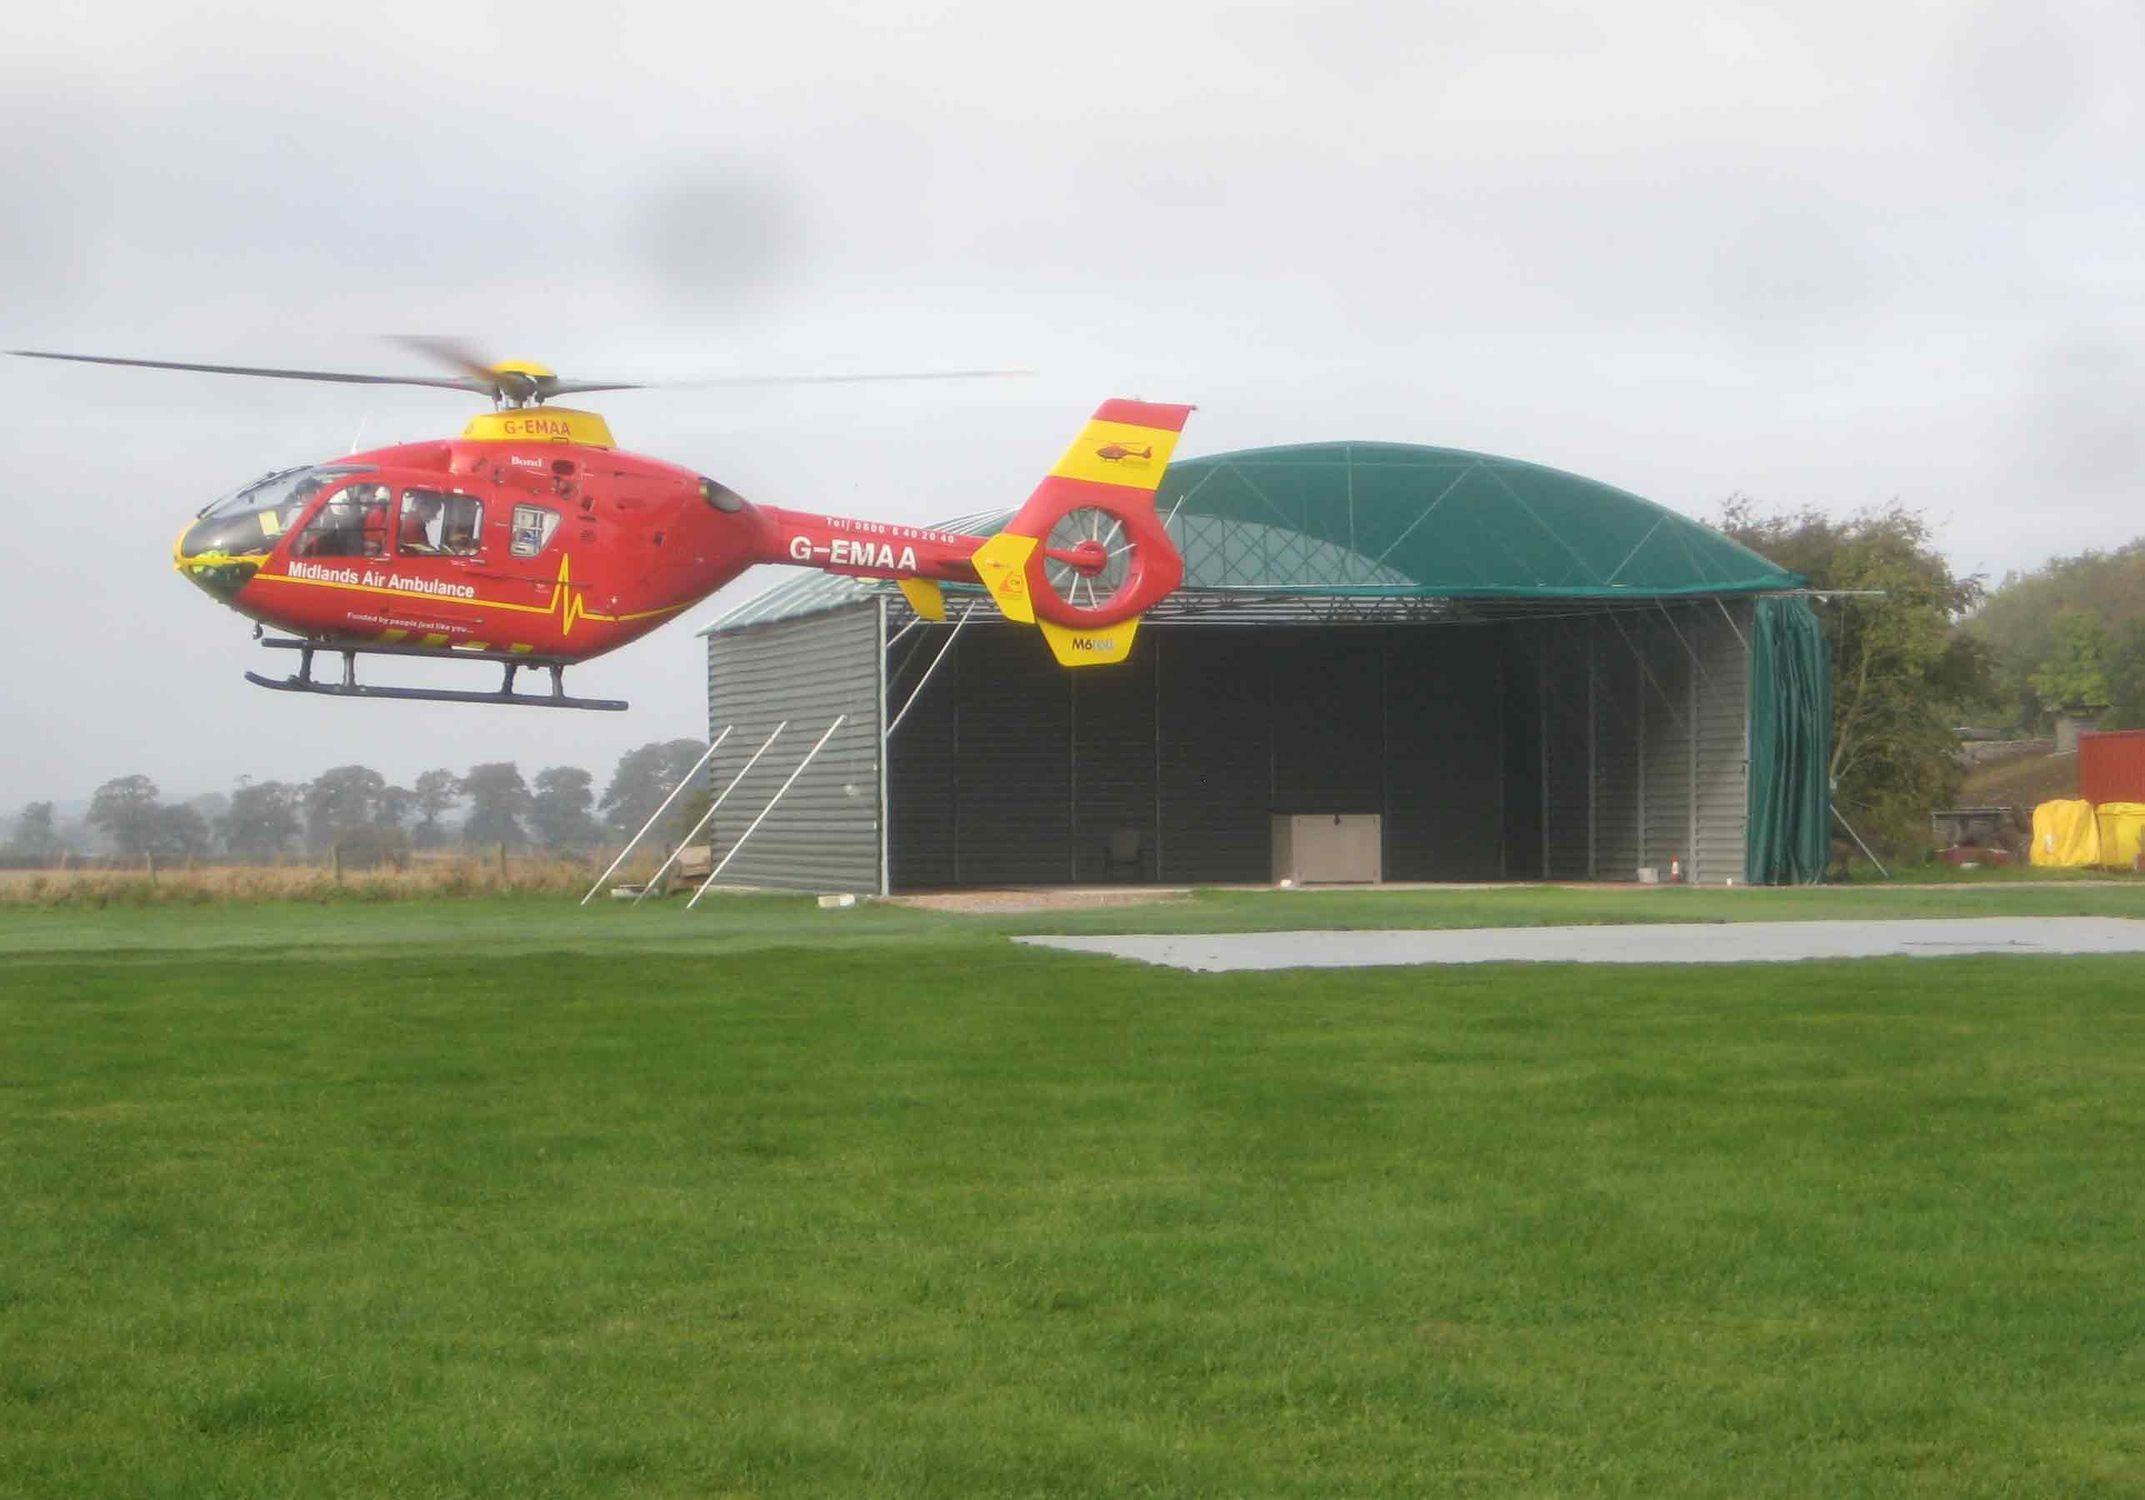 Elicottero R66 : Hangar per elicottero temporaneo per aeroporto mcgregor hangars